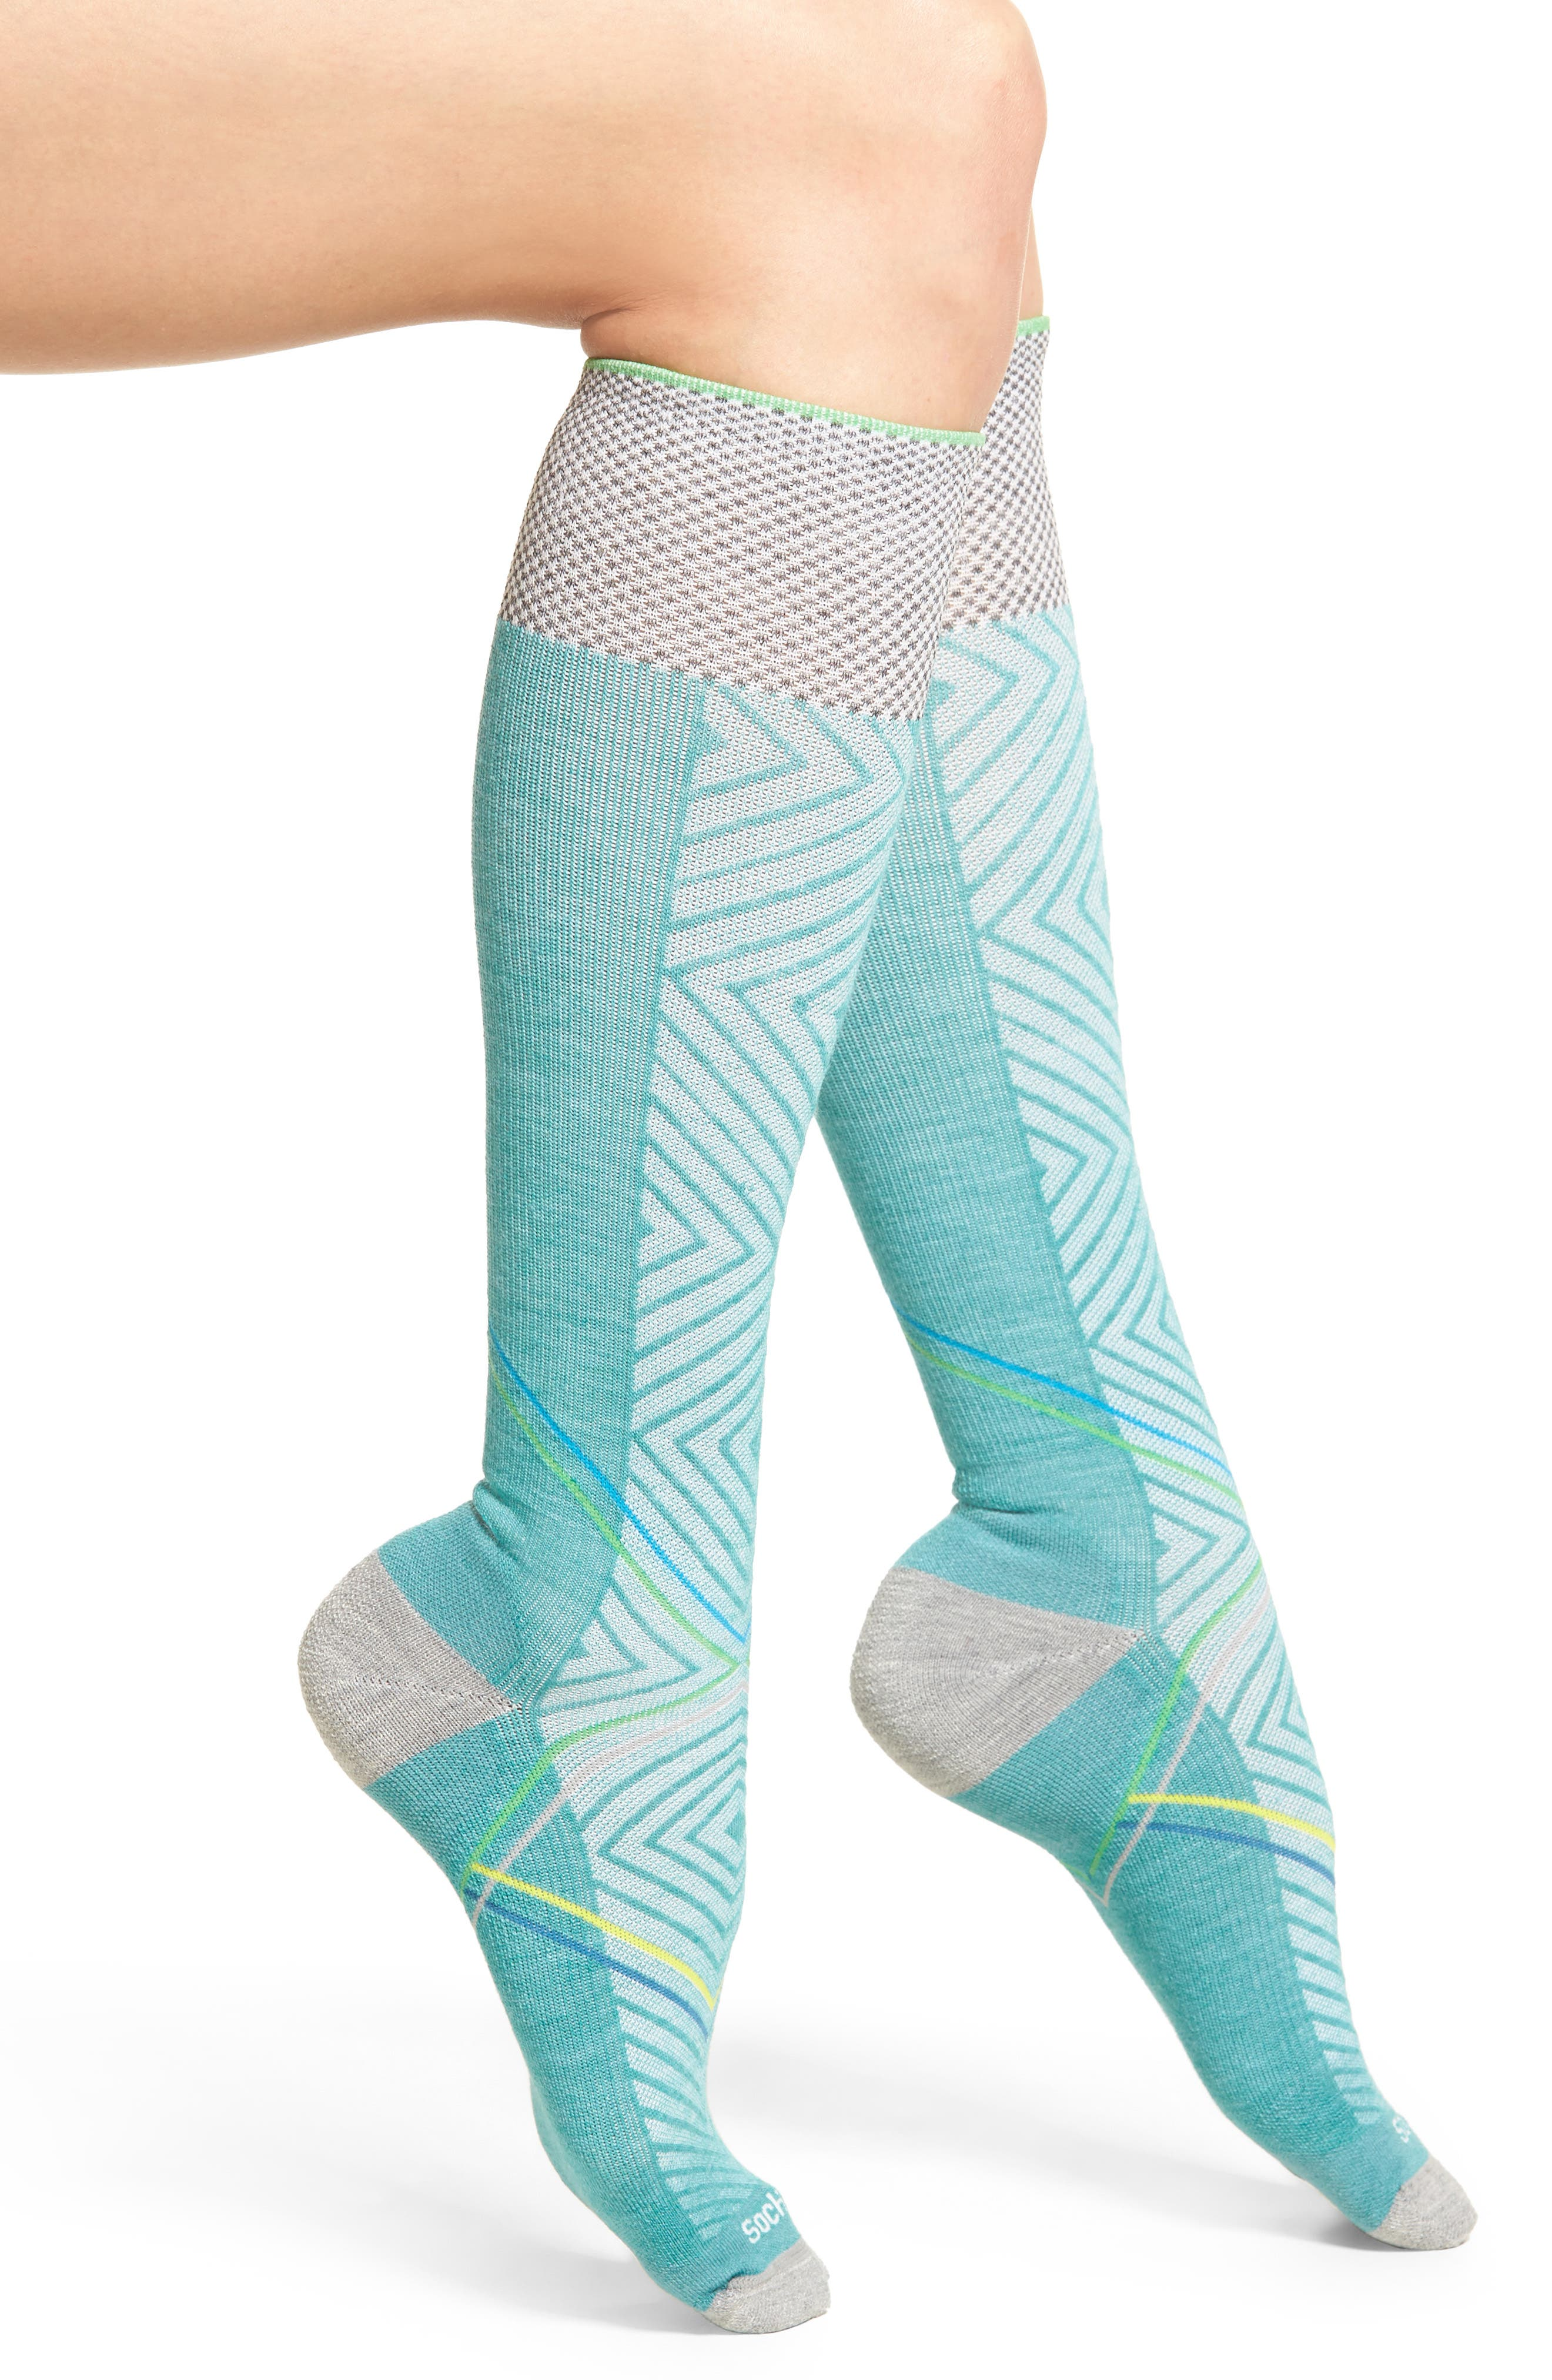 Pulse Compression Knee Socks,                         Main,                         color, 330